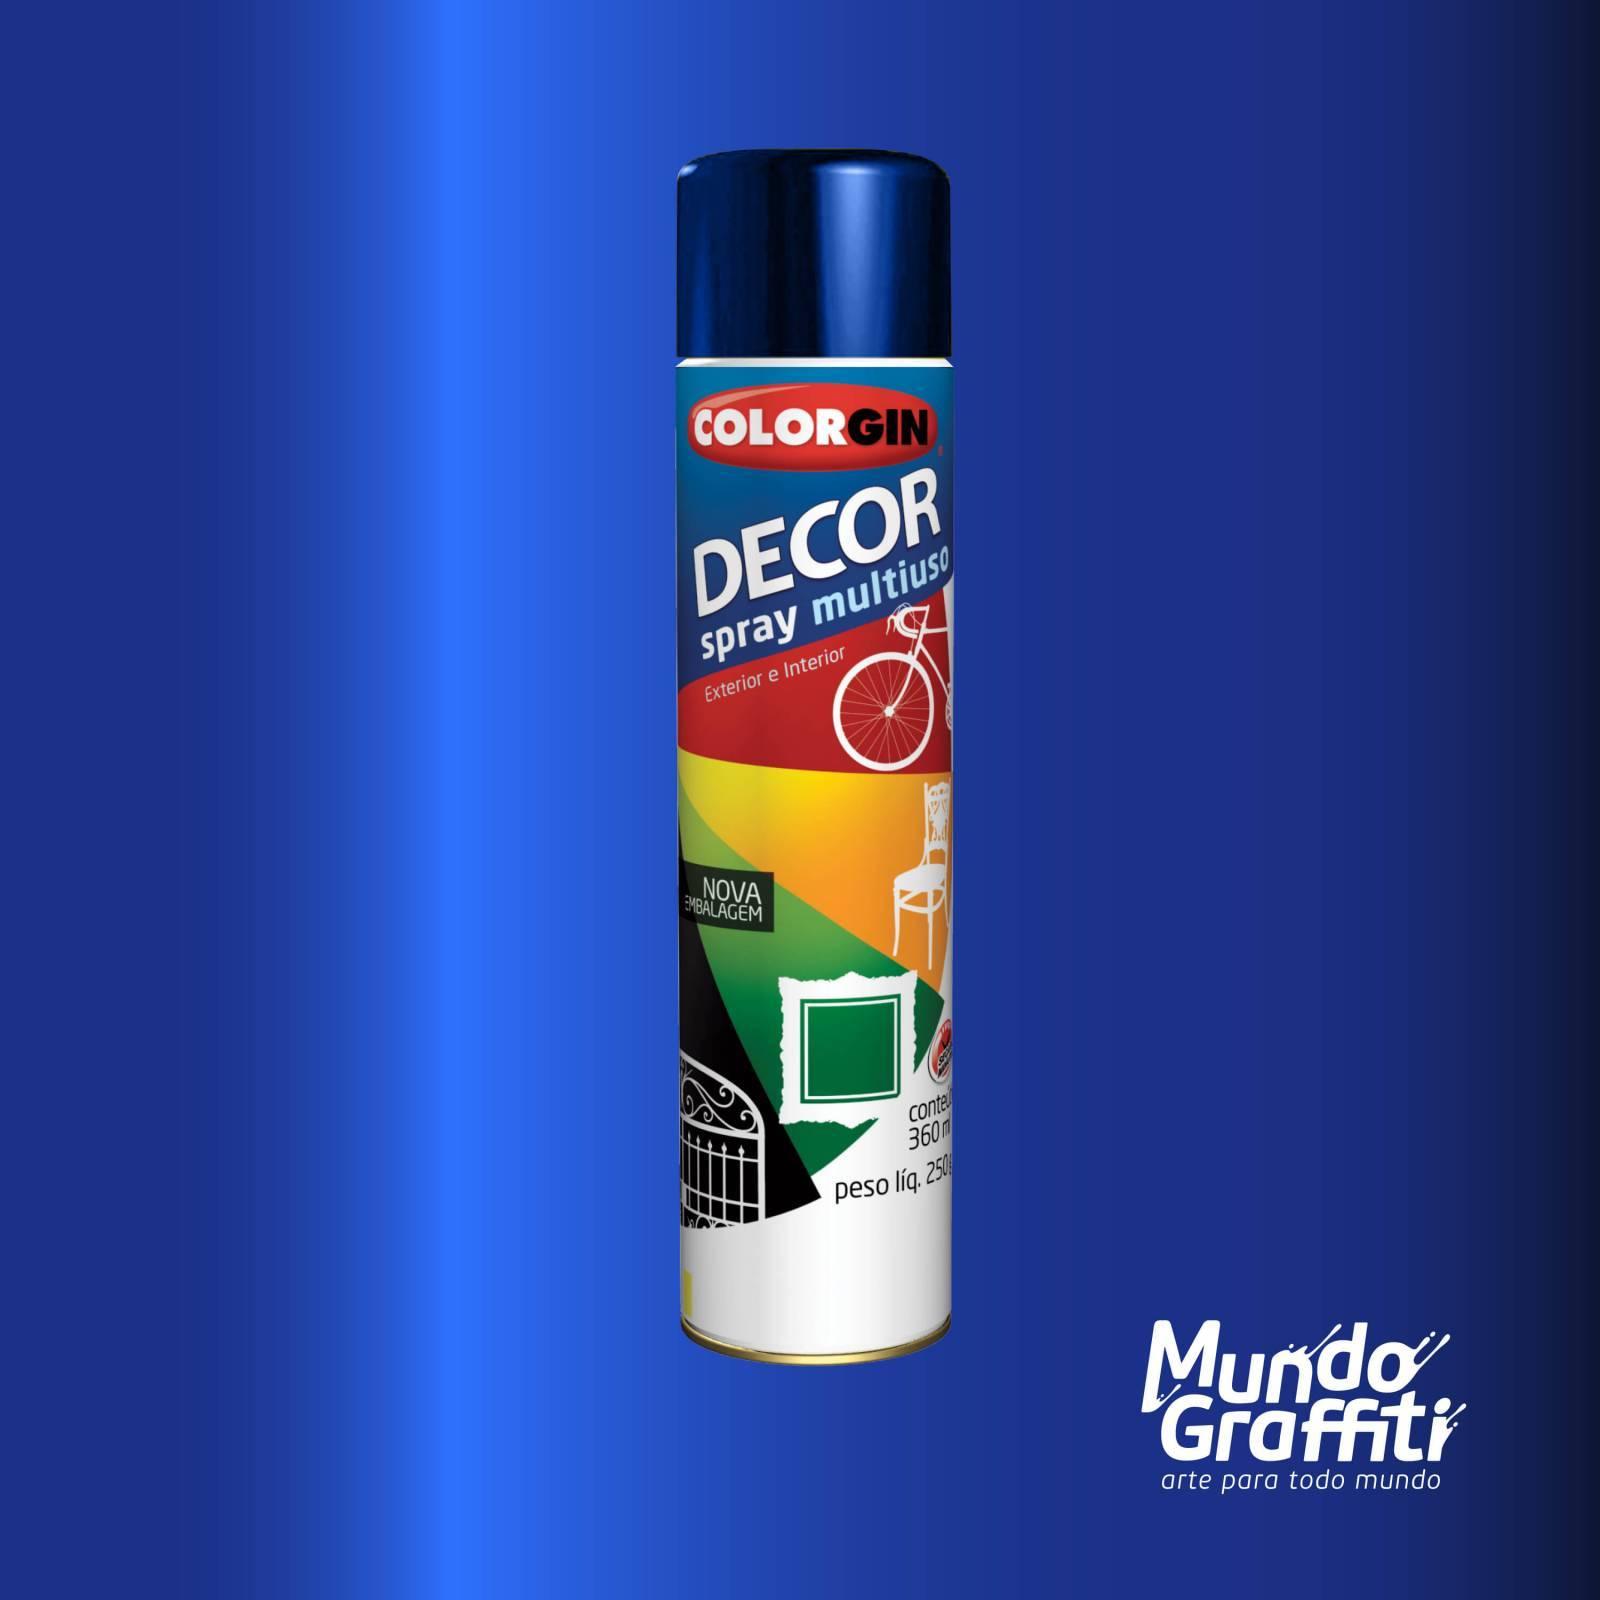 Tinta Spray Colorgin Decor 8601 Azul Angra Metalico 360ml - Mundo Graffiti